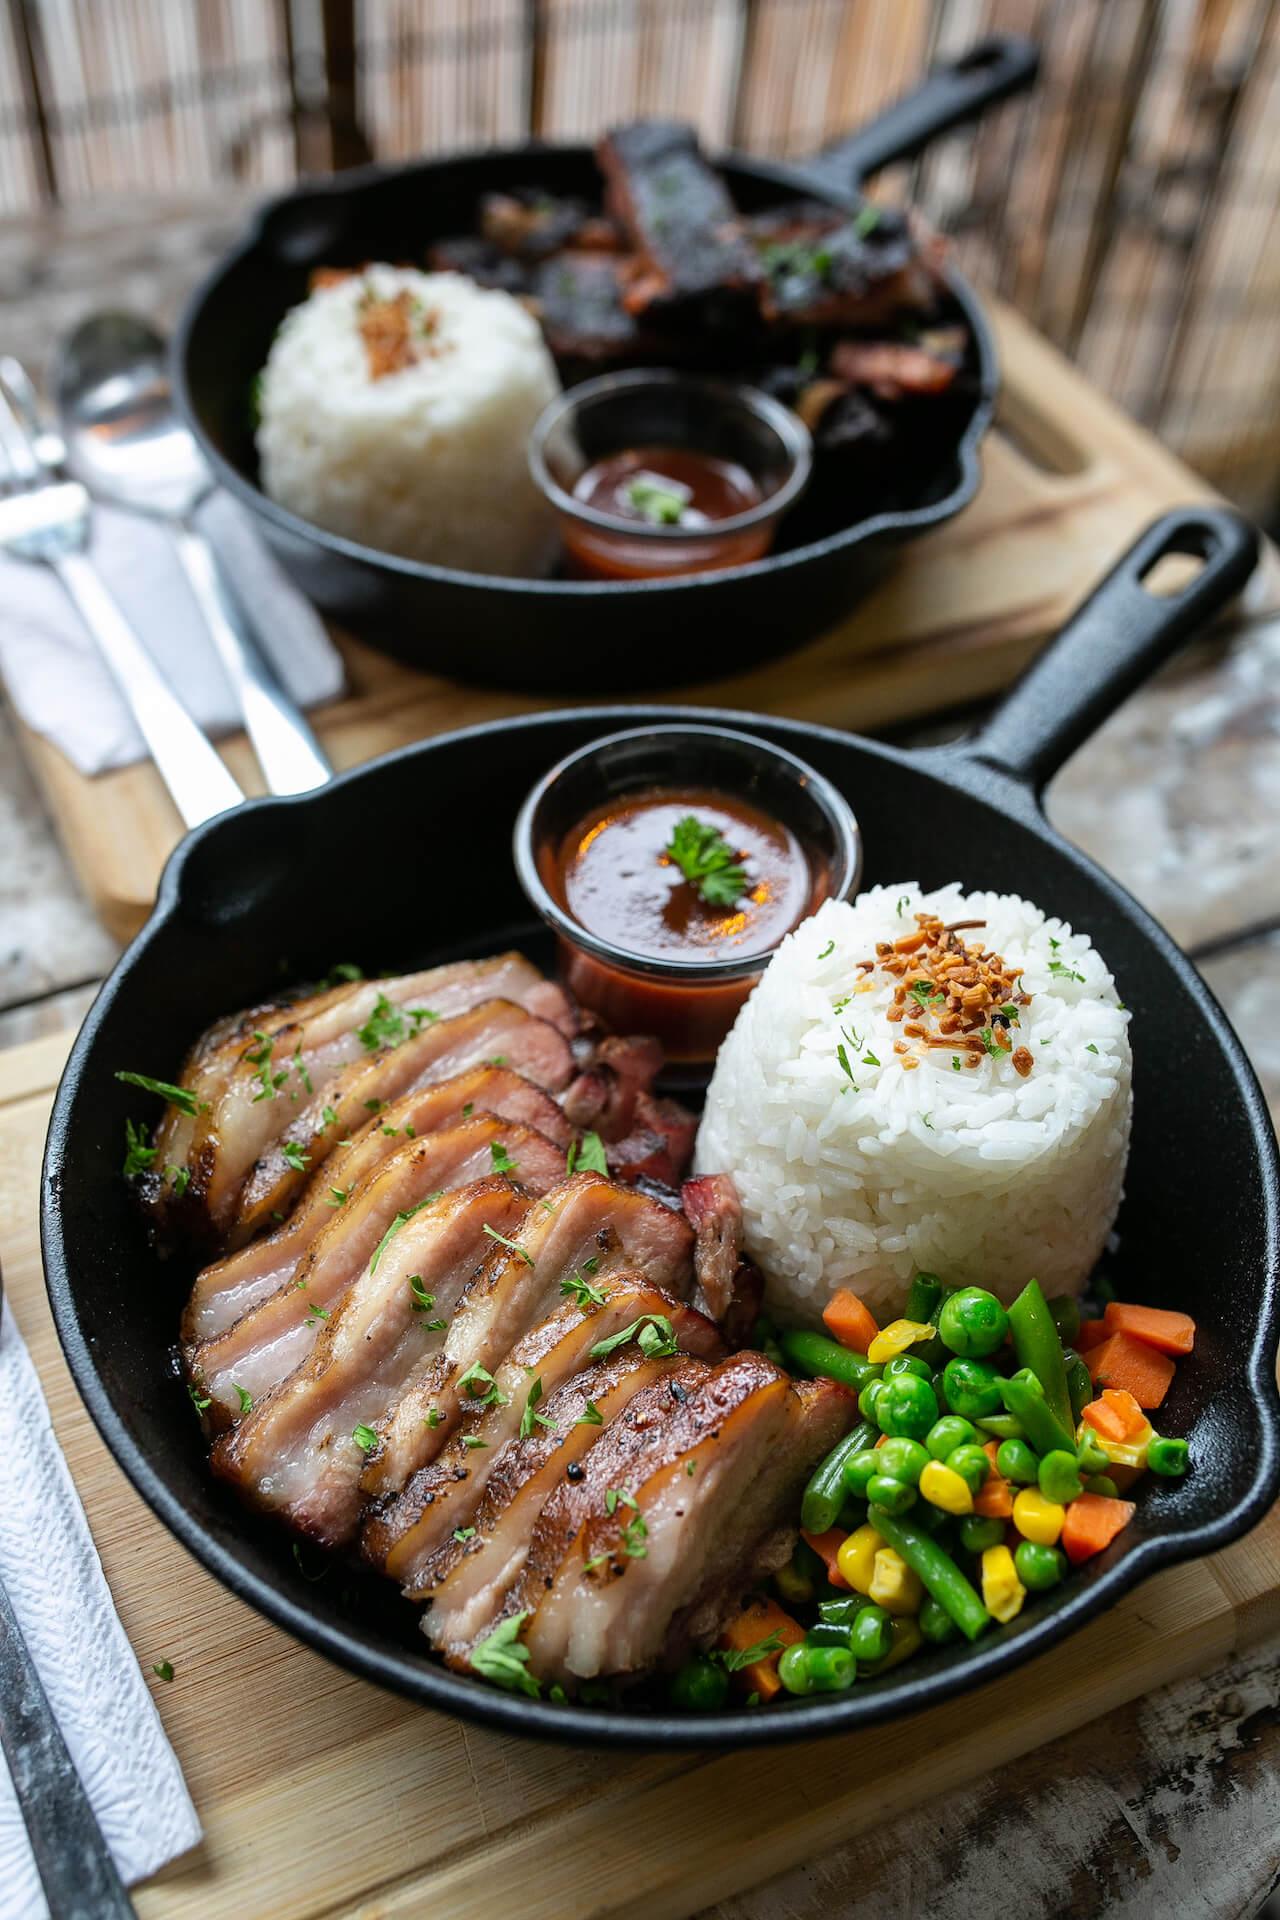 Viajero cafe's roasted pork belly at Cagayan de Oro city